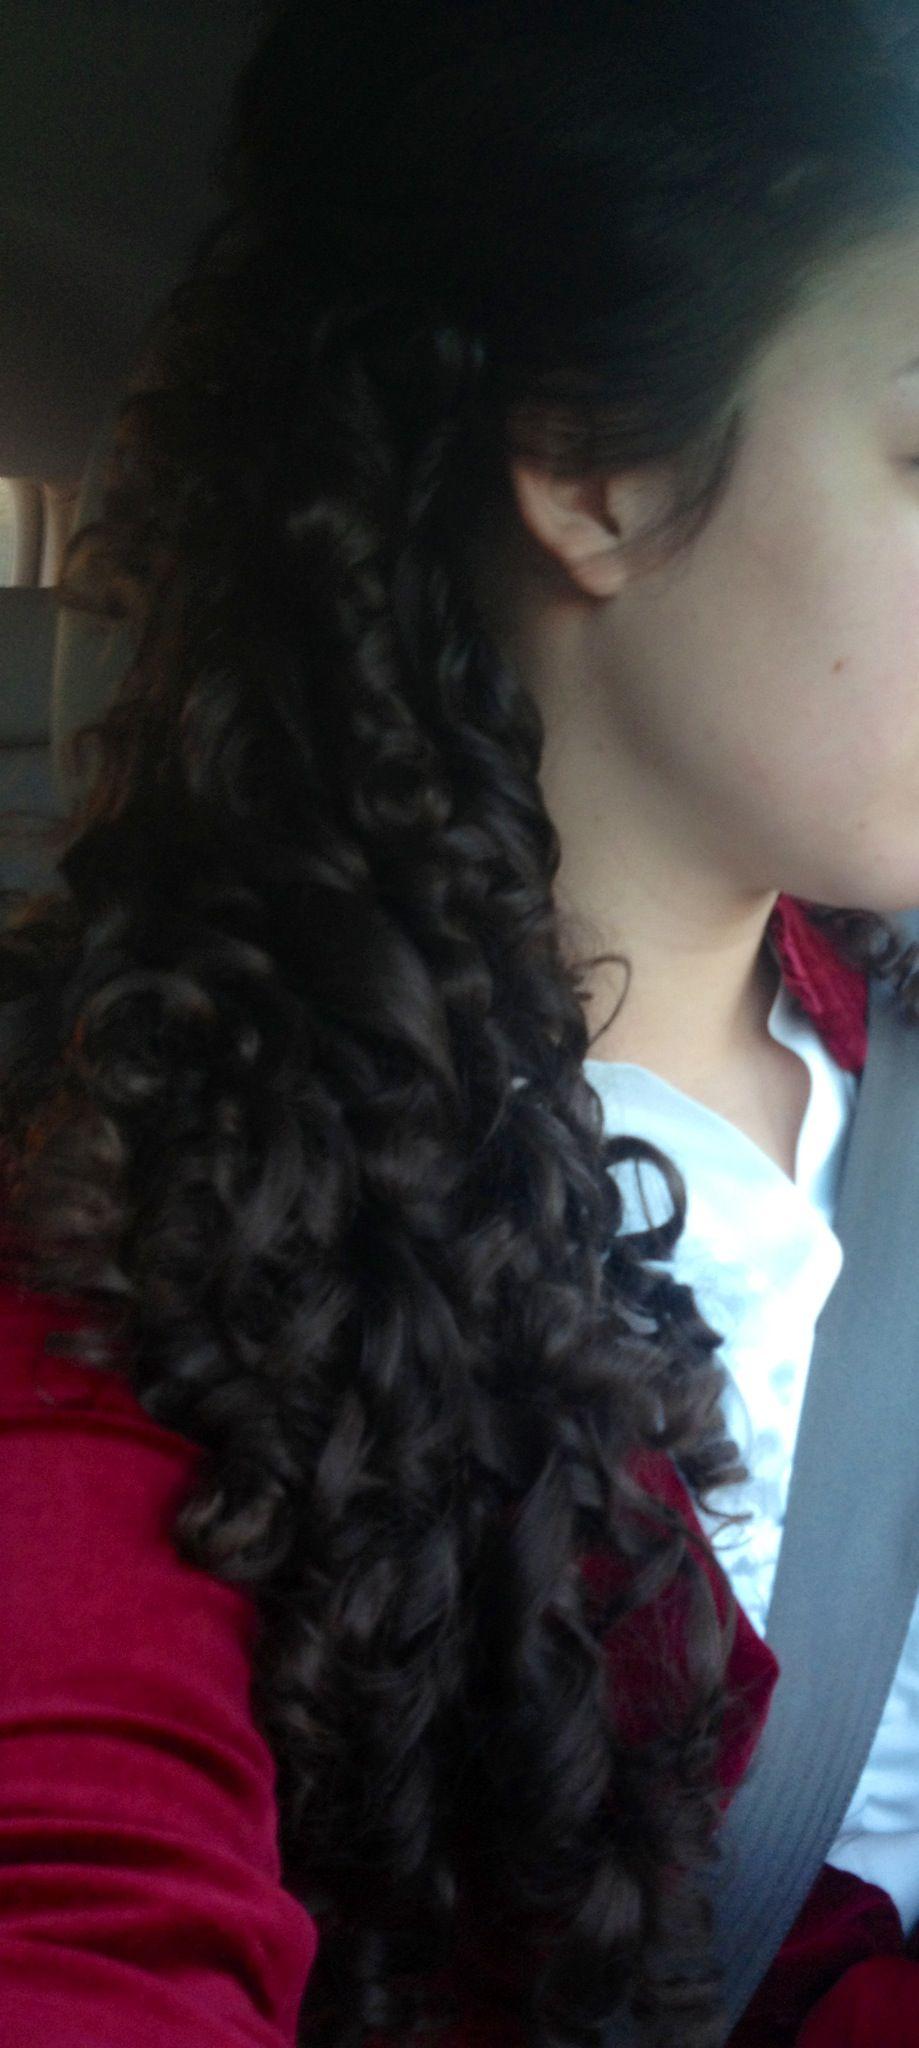 long hair don't care! apostolic style. uncut curls :) | hair